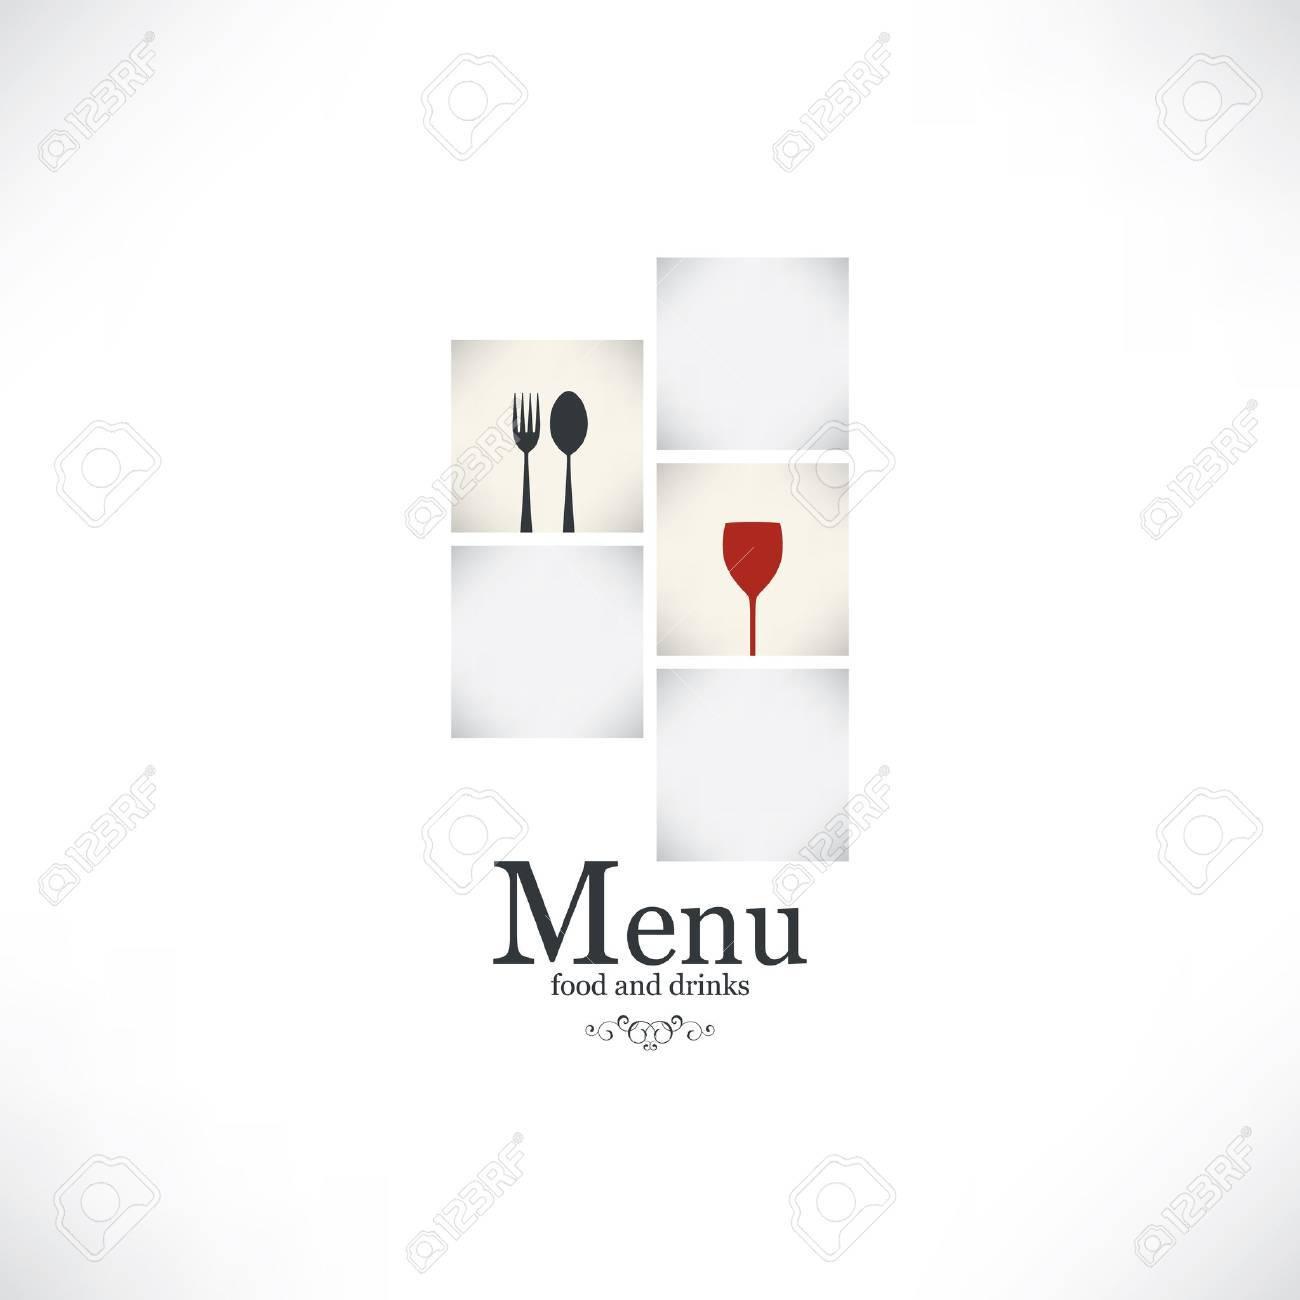 Restaurant menu design Stock Vector - 17989291